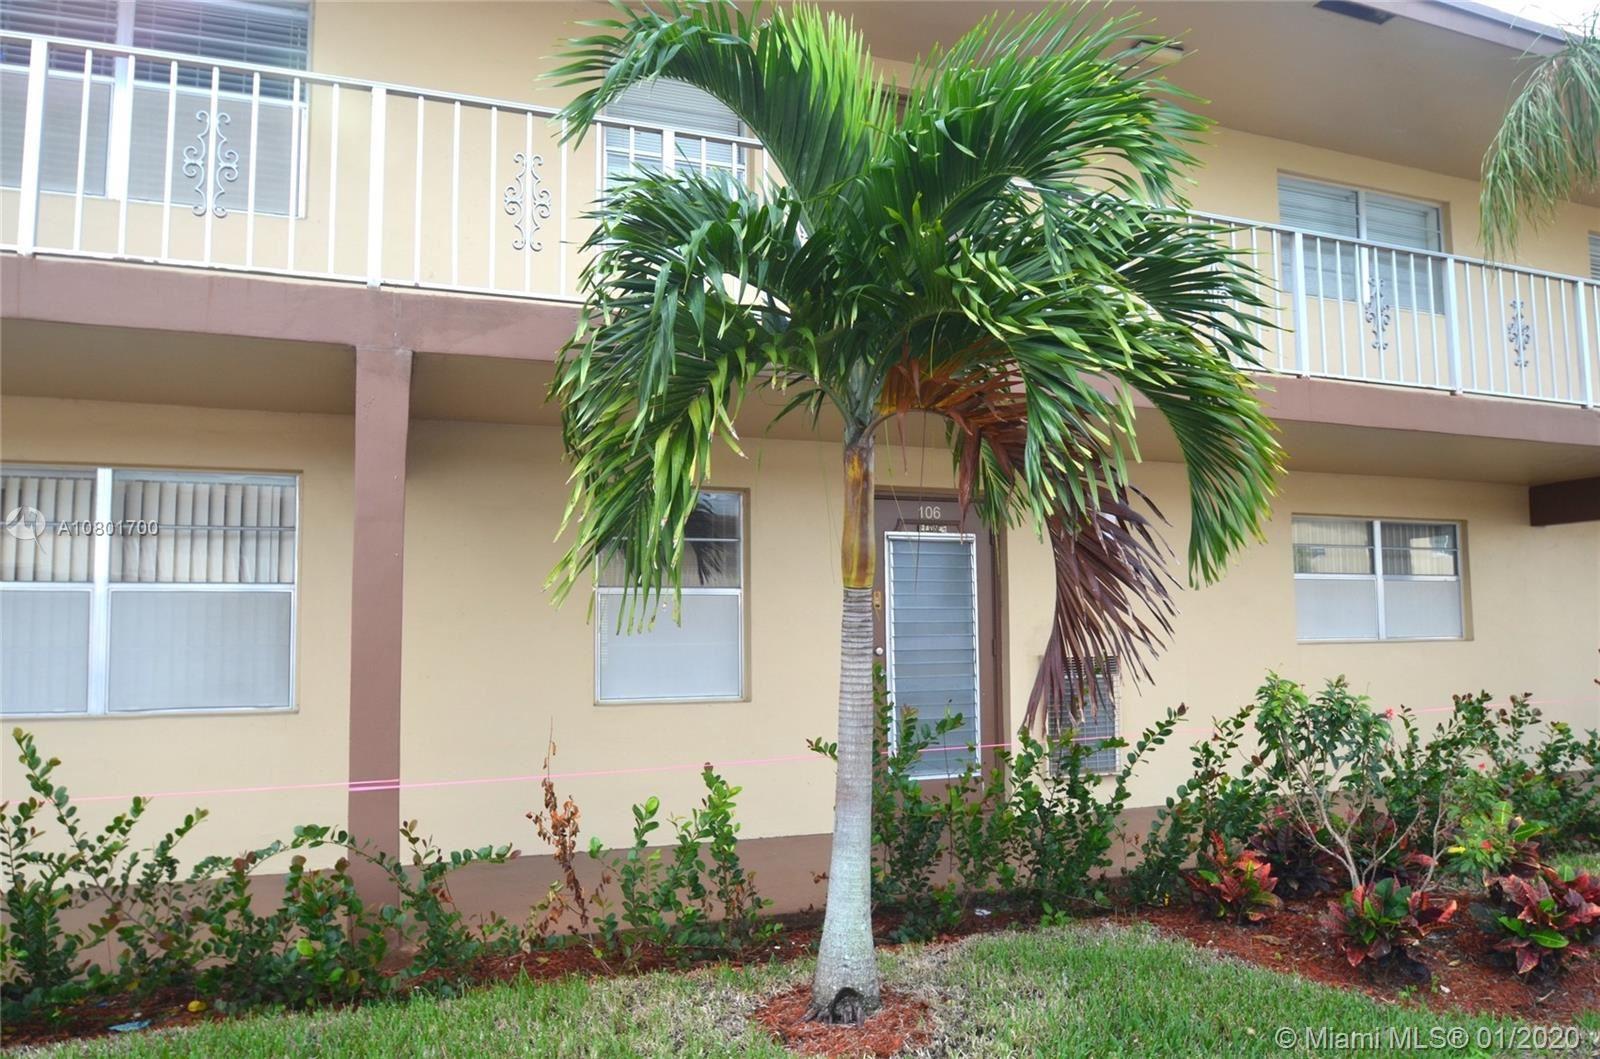 7200 NW 5th Pl #106, Margate, FL 33063 - MLS#: A10801700